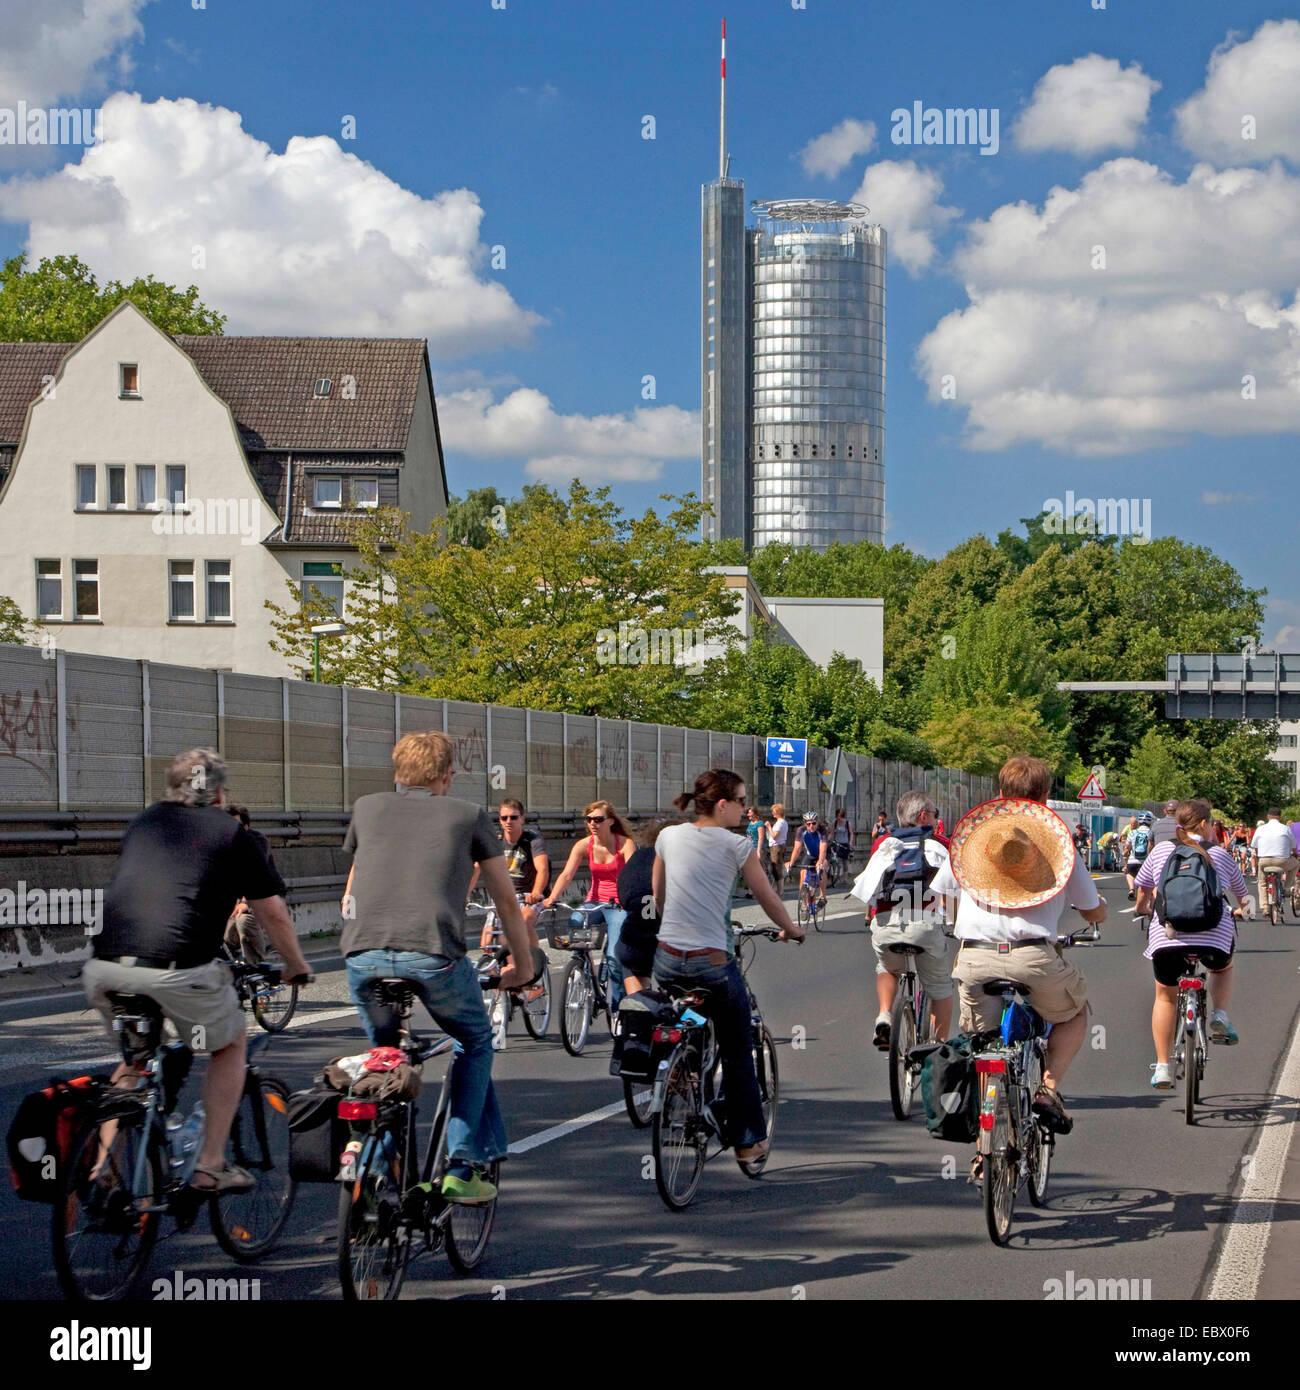 bikers on the event 'Still-Leben Ruhrschnellweg' on highway A 40, Germany, North Rhine-Westphalia, Ruhr - Stock Image